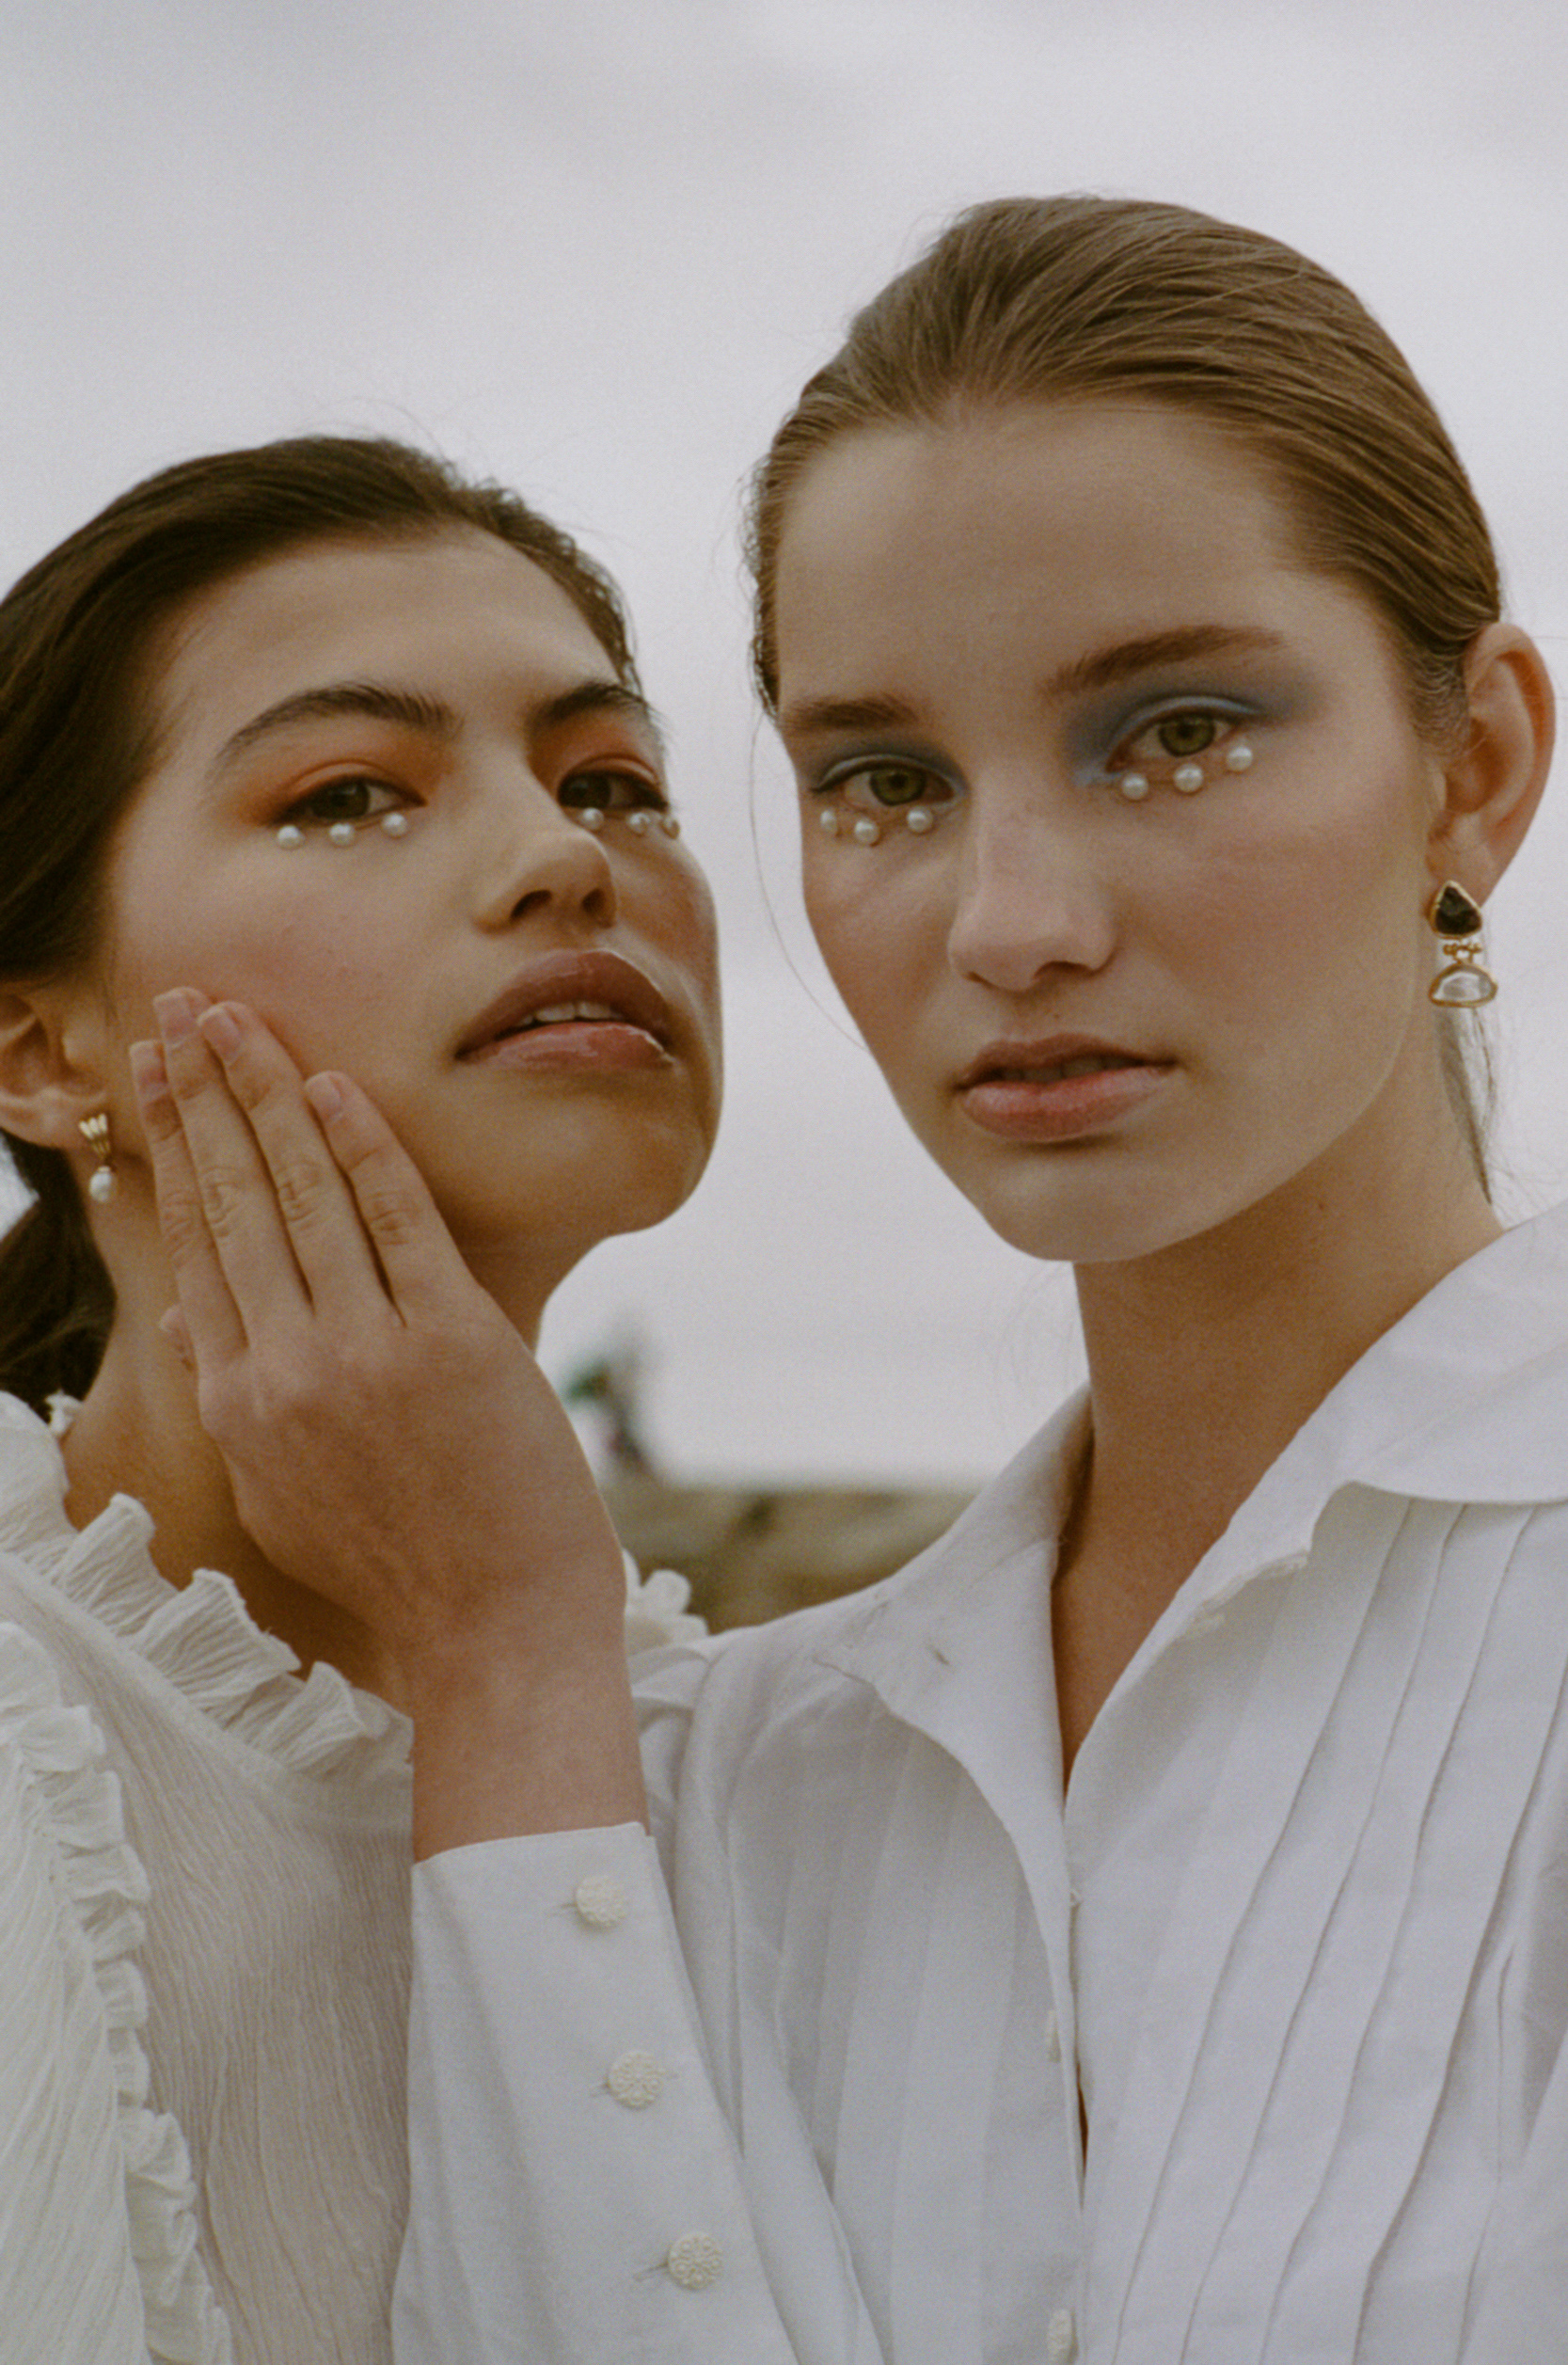 Moniqu Yi-tan Koschier (@myloh8) & Santa Konstantinova (@santa.kss), Make up by Ana Costa (@anacostamua)